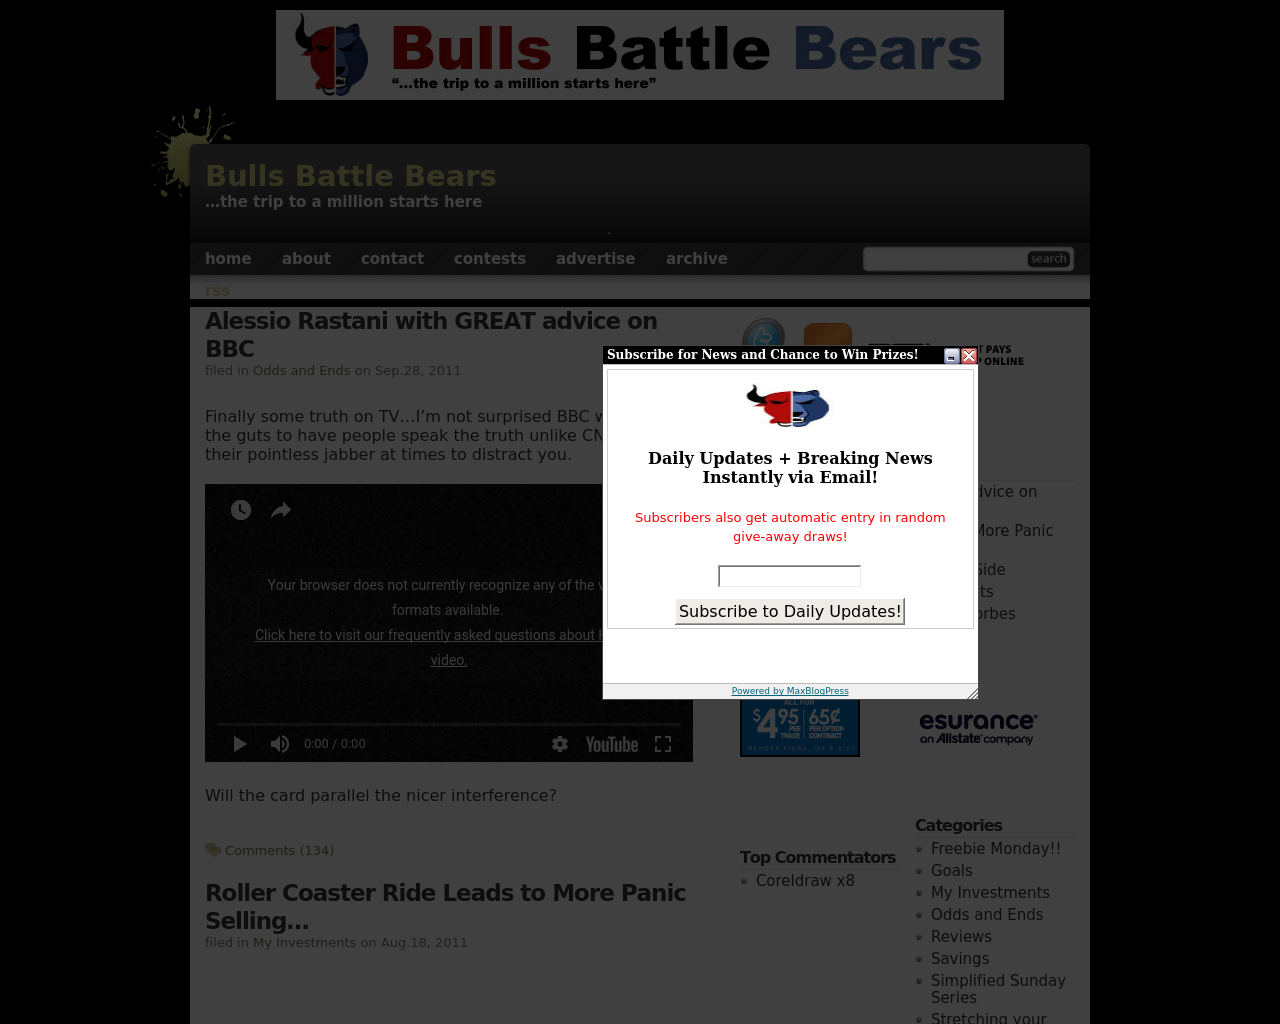 Bulls-Battle-Bears-Advertising-Reviews-Pricing